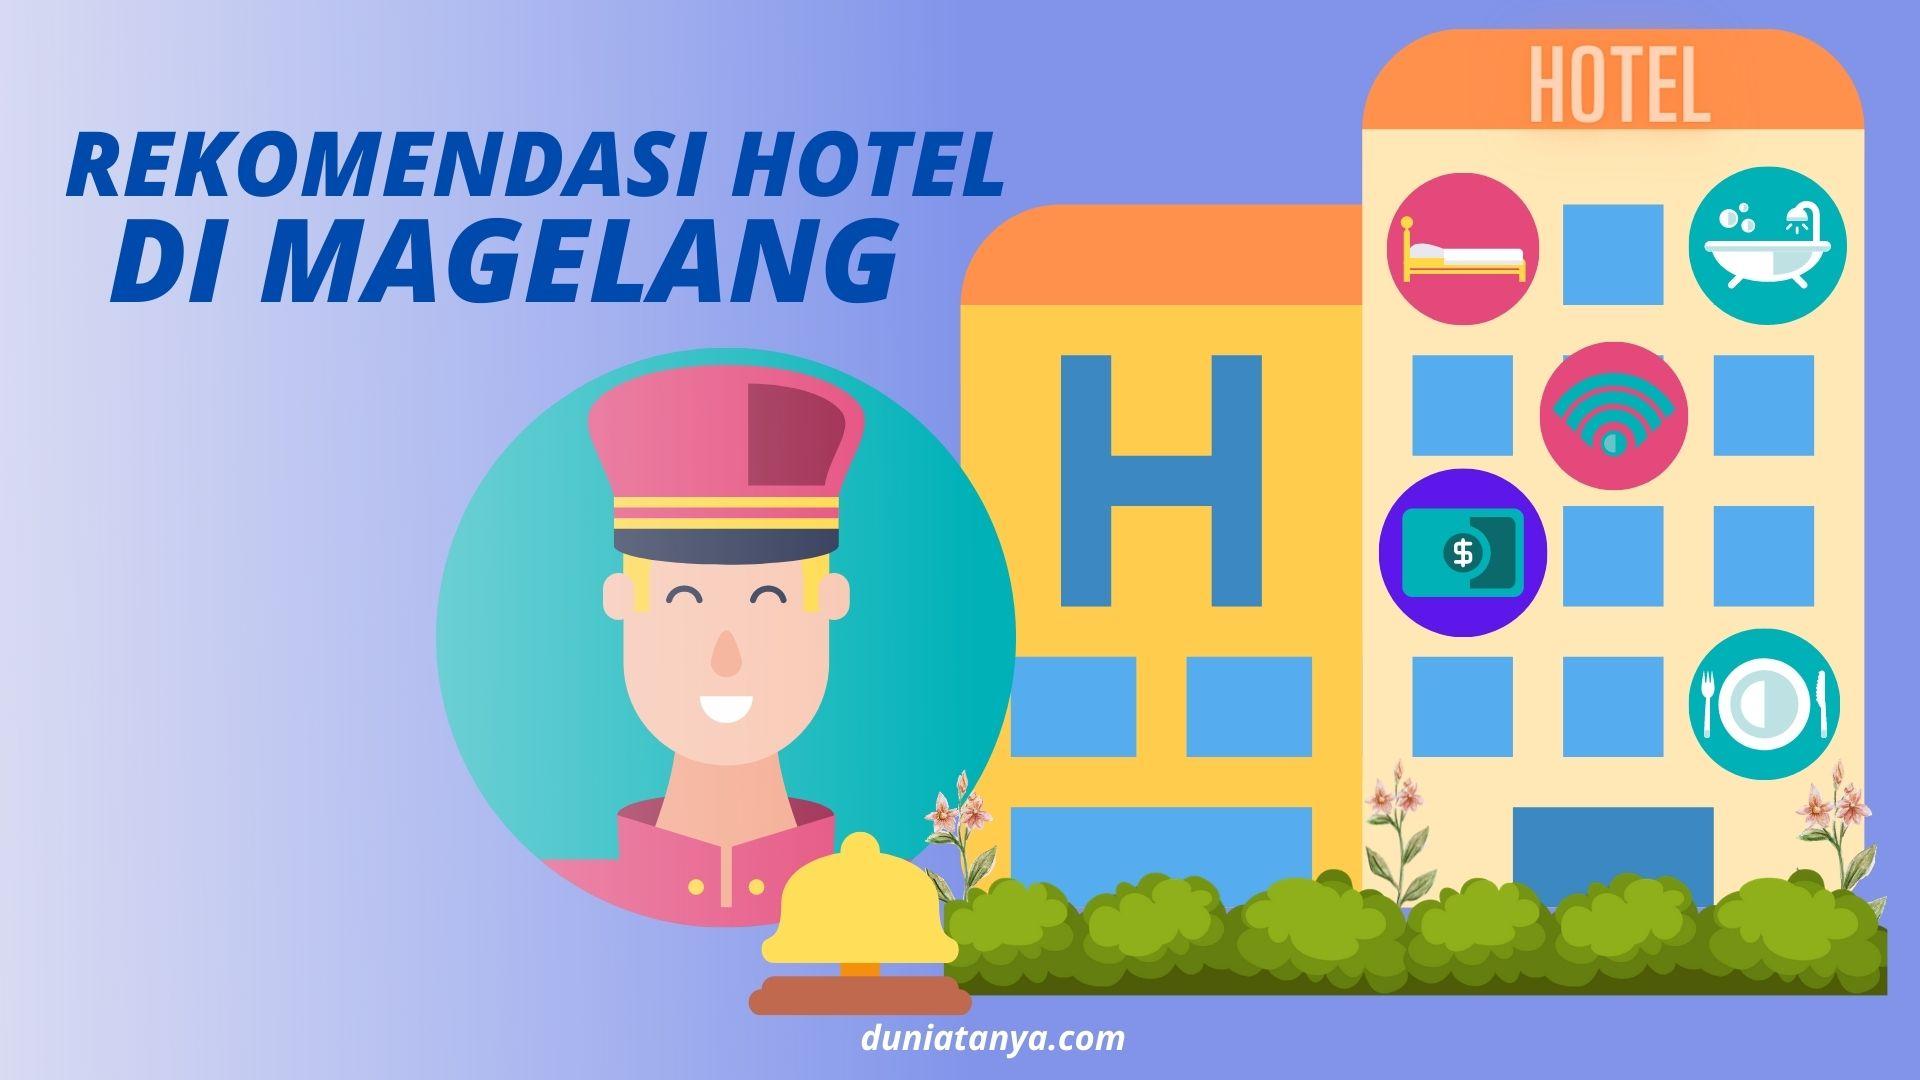 You are currently viewing Rekomendasi Hotel Di Magelang